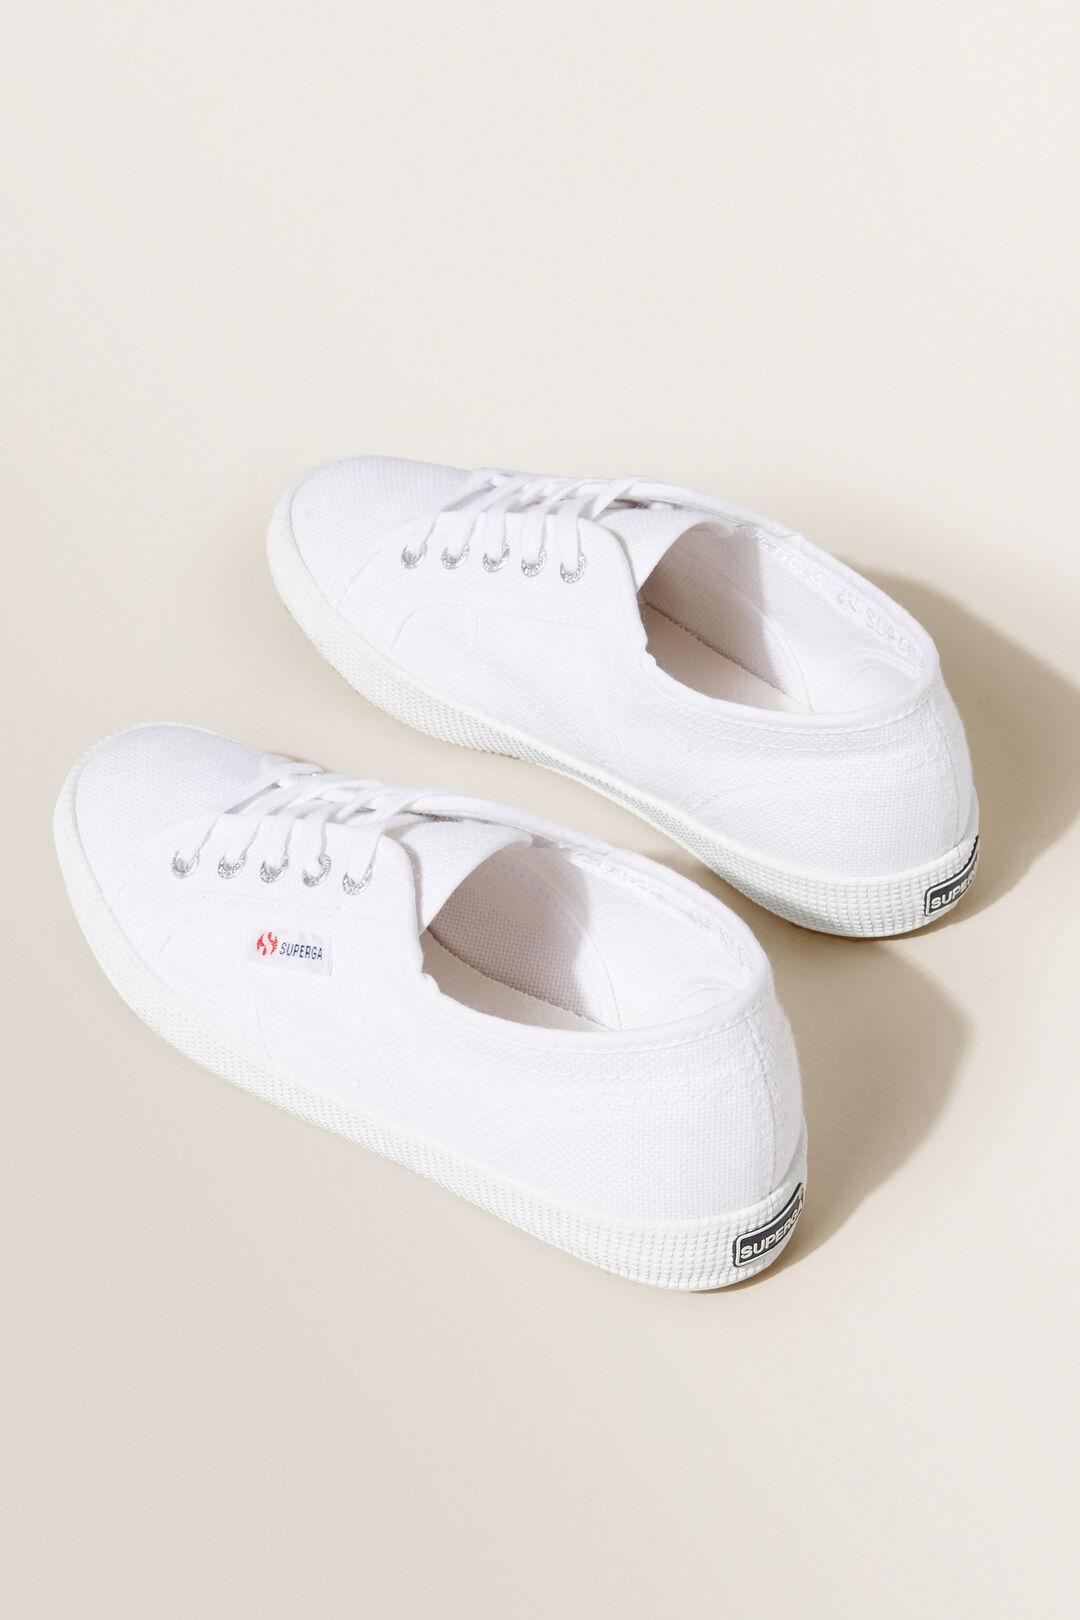 Superga Classic Laceup Sneaker  WHITE  hi-res